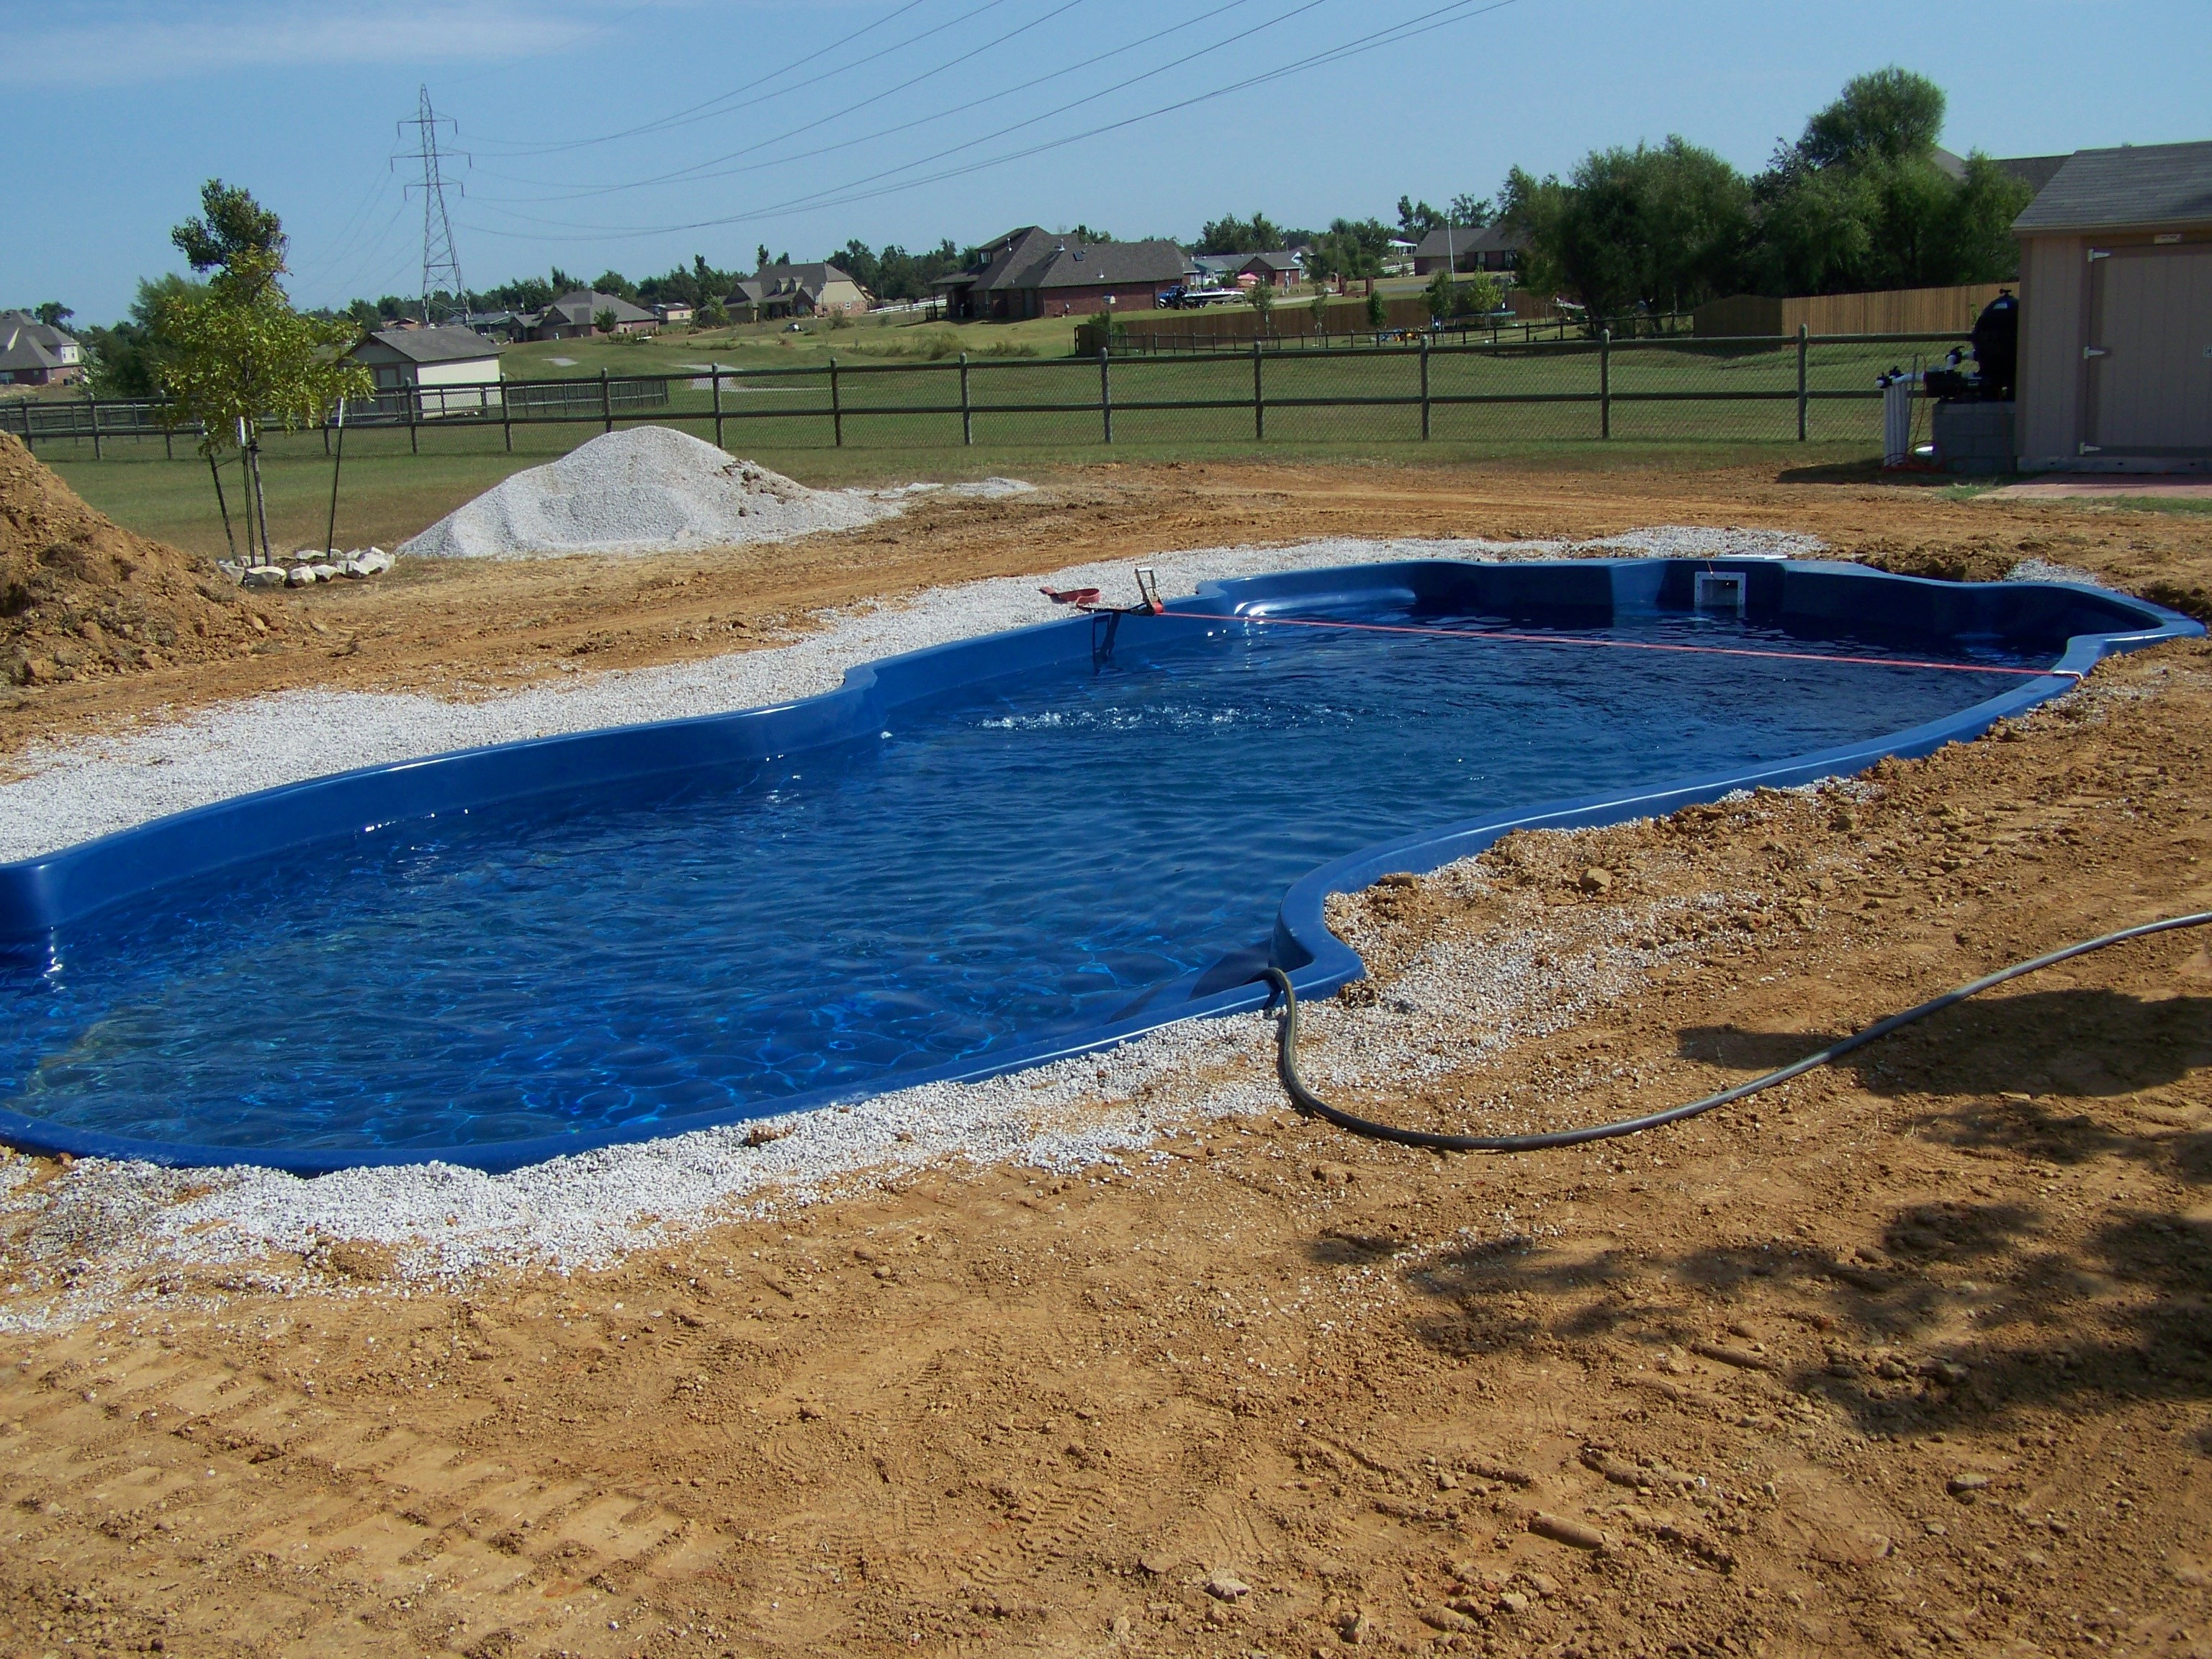 Fiberglass Pool Construction : Fiberglass pools tulsa ok swimming pool contractor and